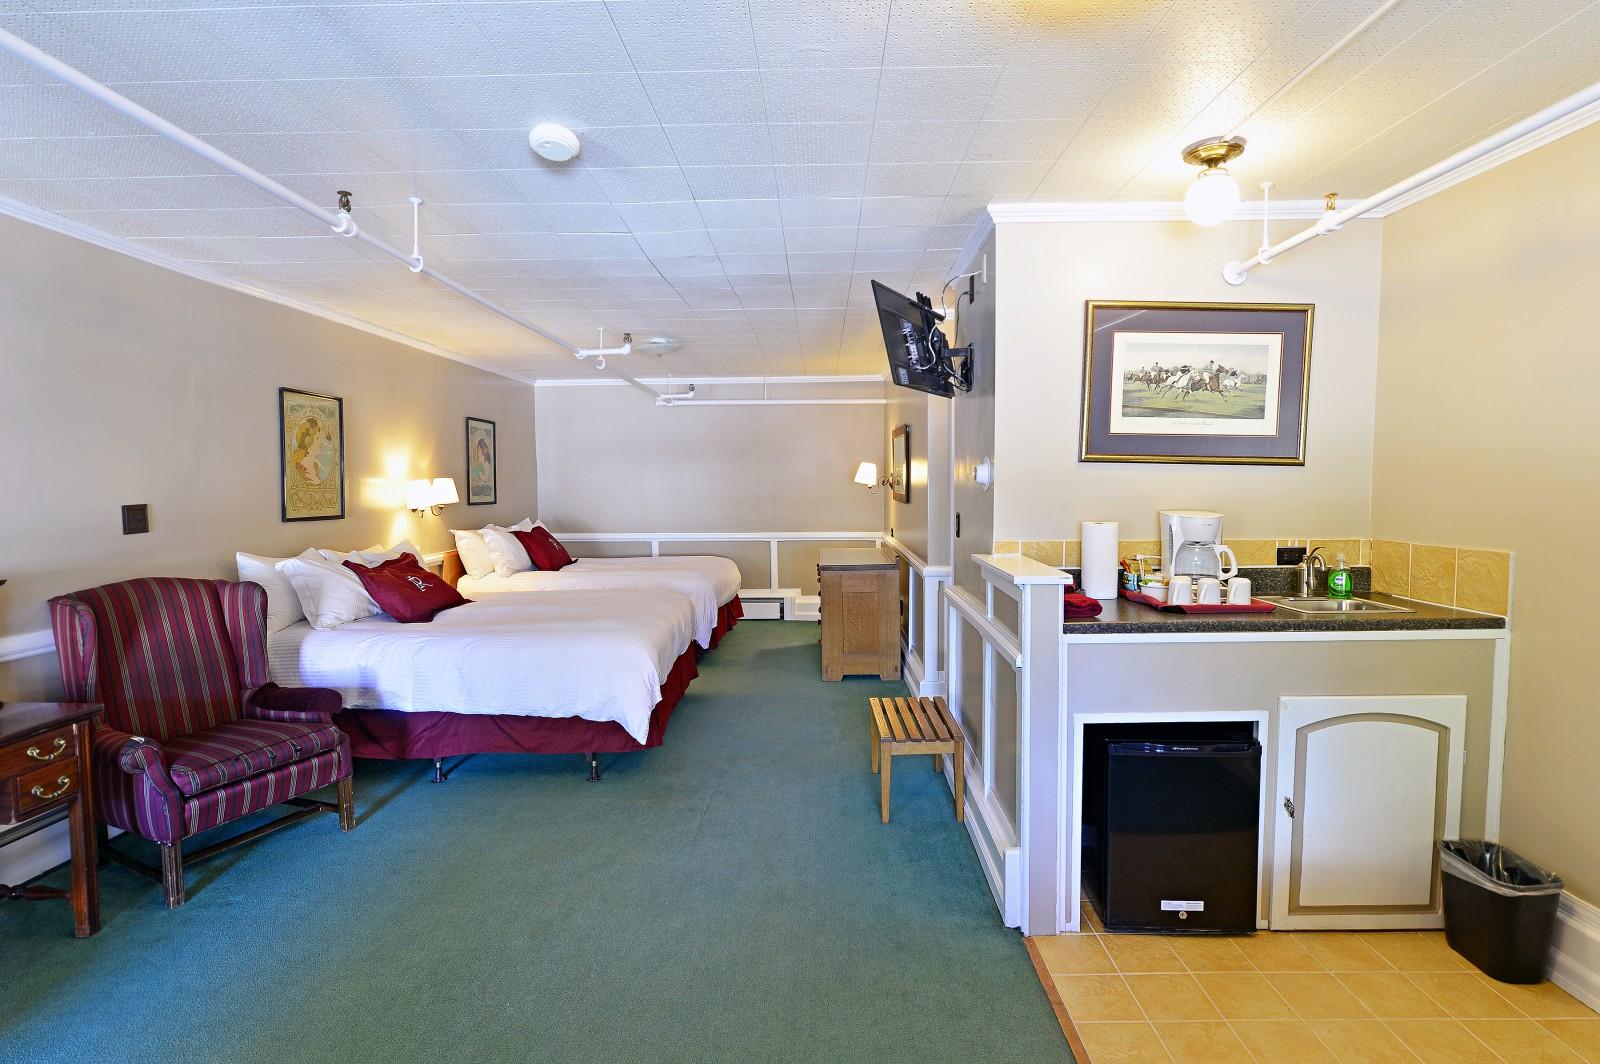 Redstone Inn Terrace Hotel Room, Colorado